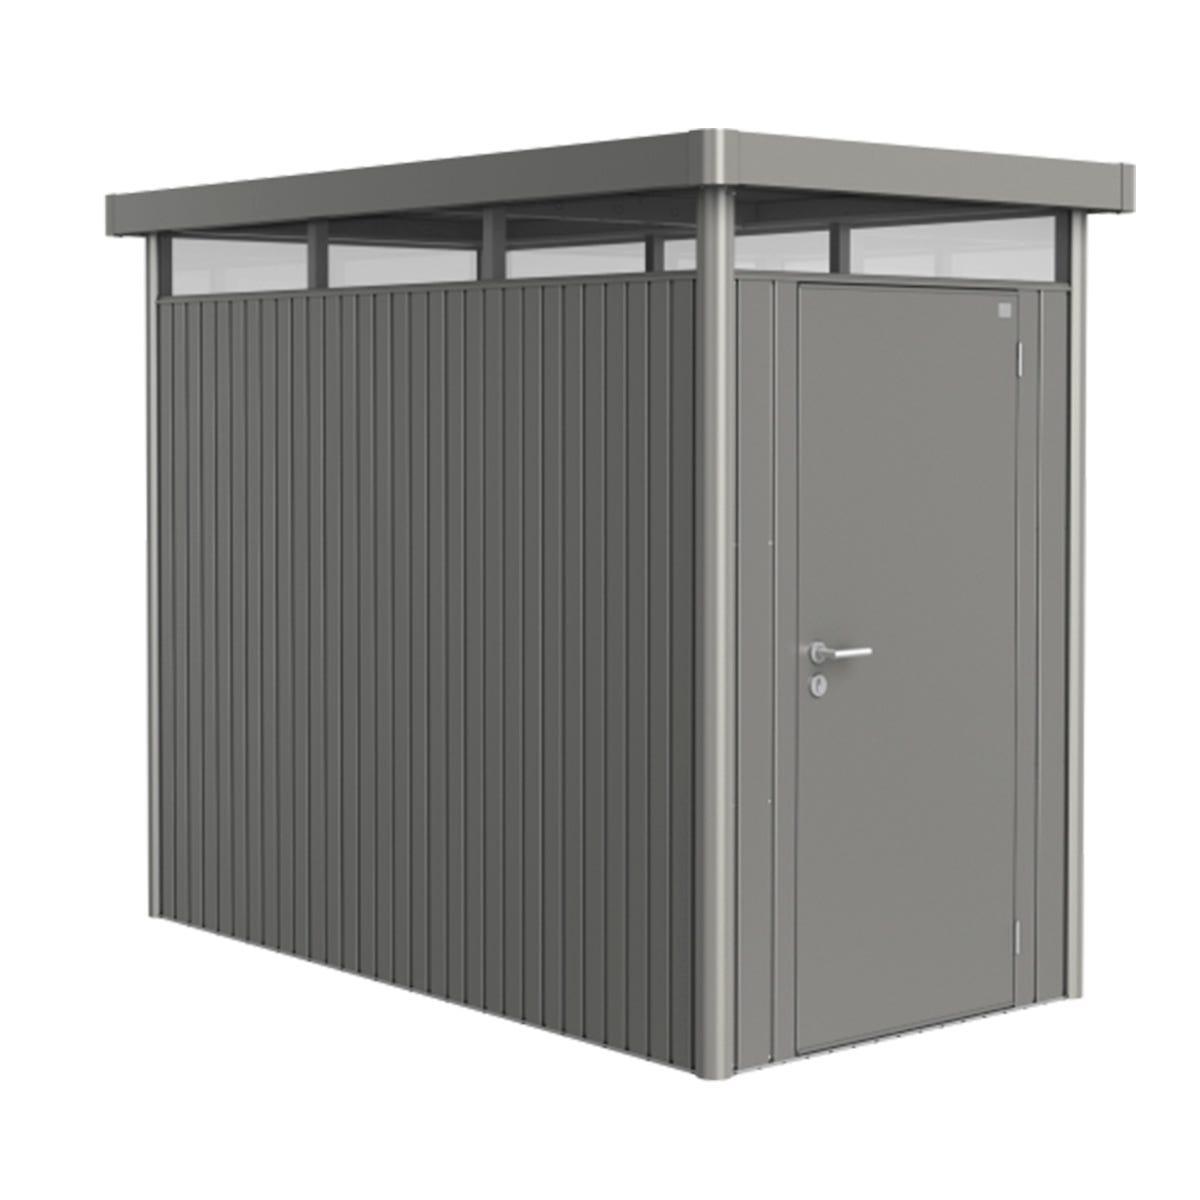 Biohort Highline Metal Shed HS Standard door 5 x 9 - Quartz Grey